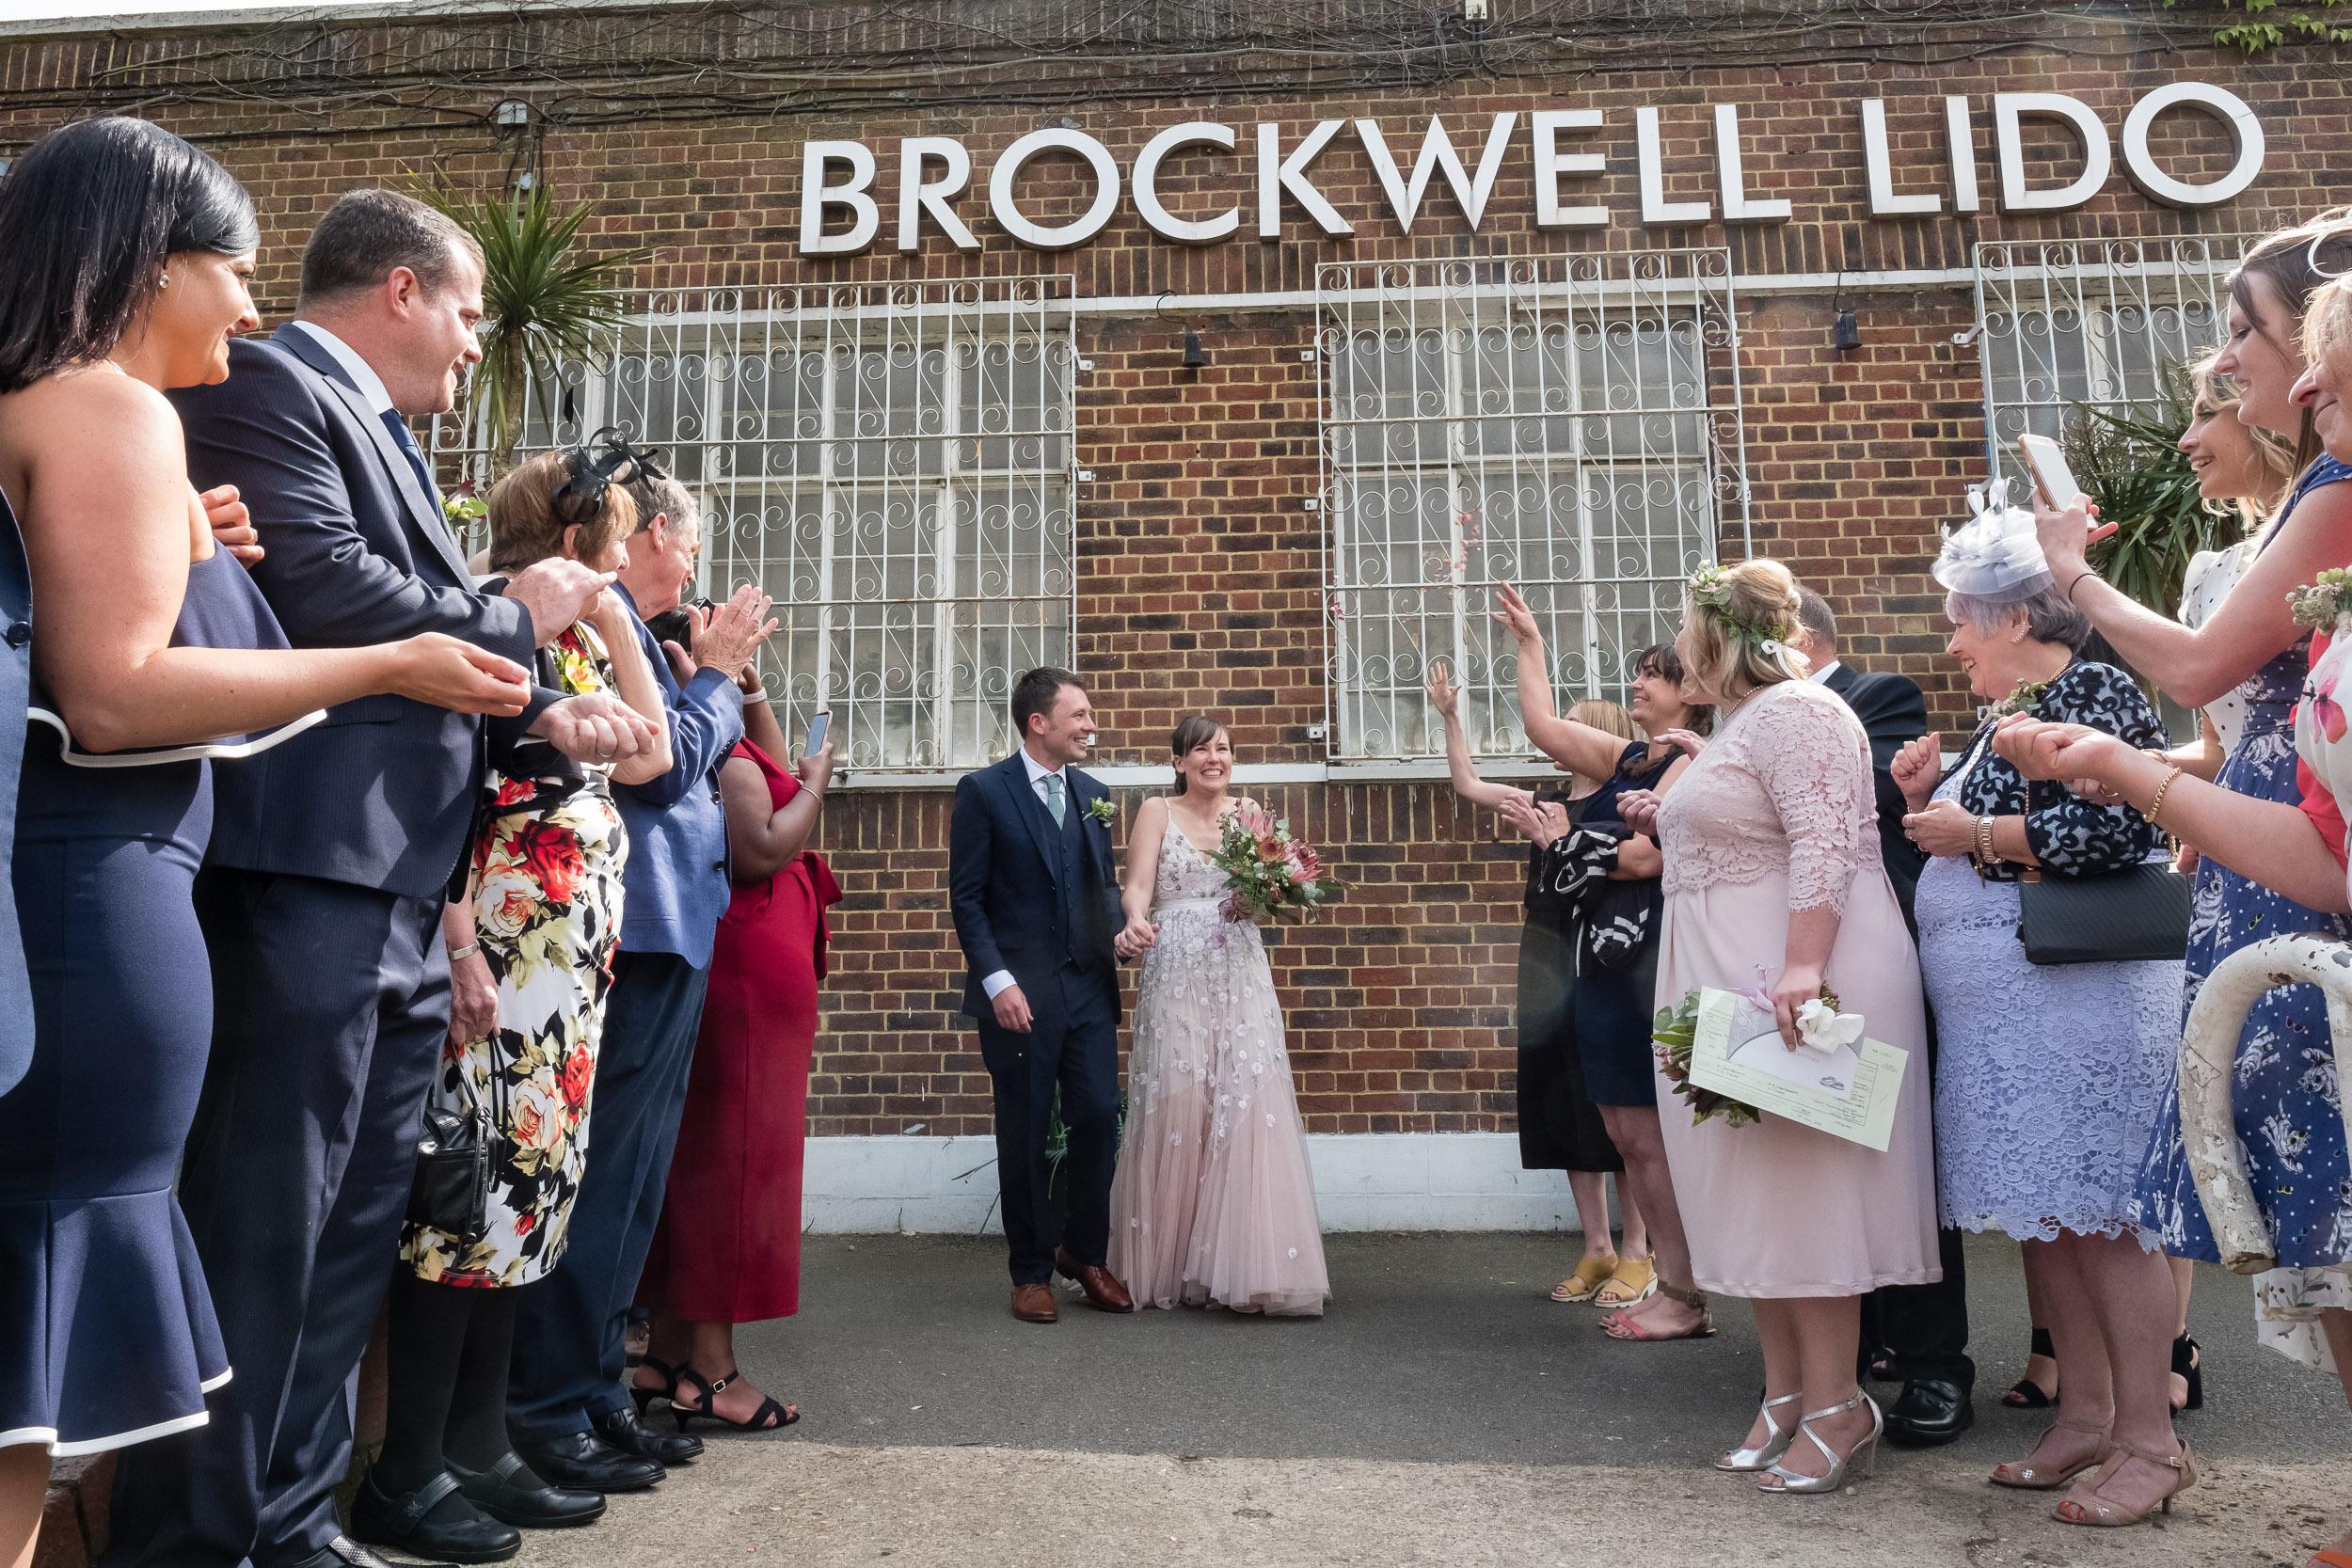 brockwell-lido-brixton-herne-hill-wedding-205.jpg